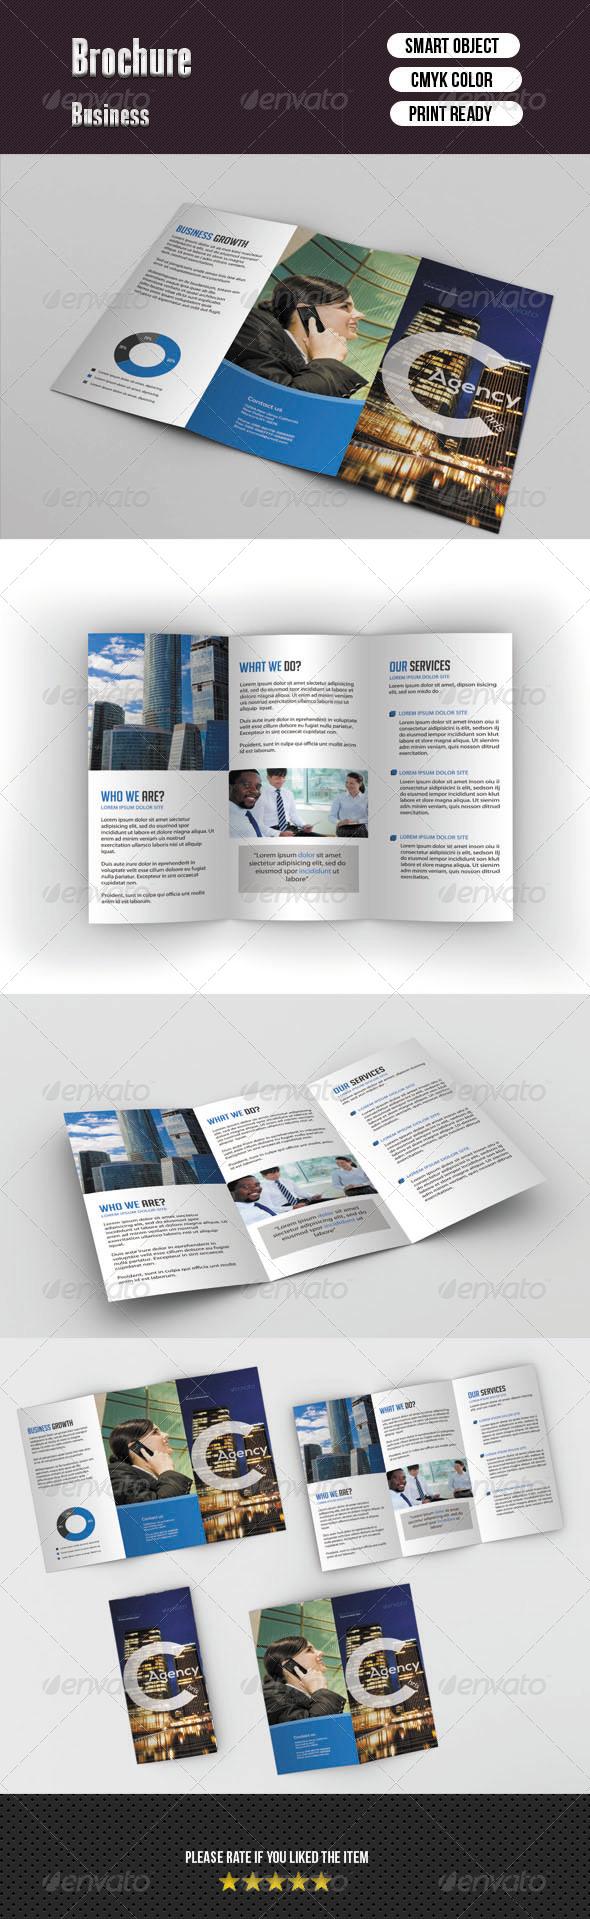 Tifold Brochure-Business - Corporate Brochures